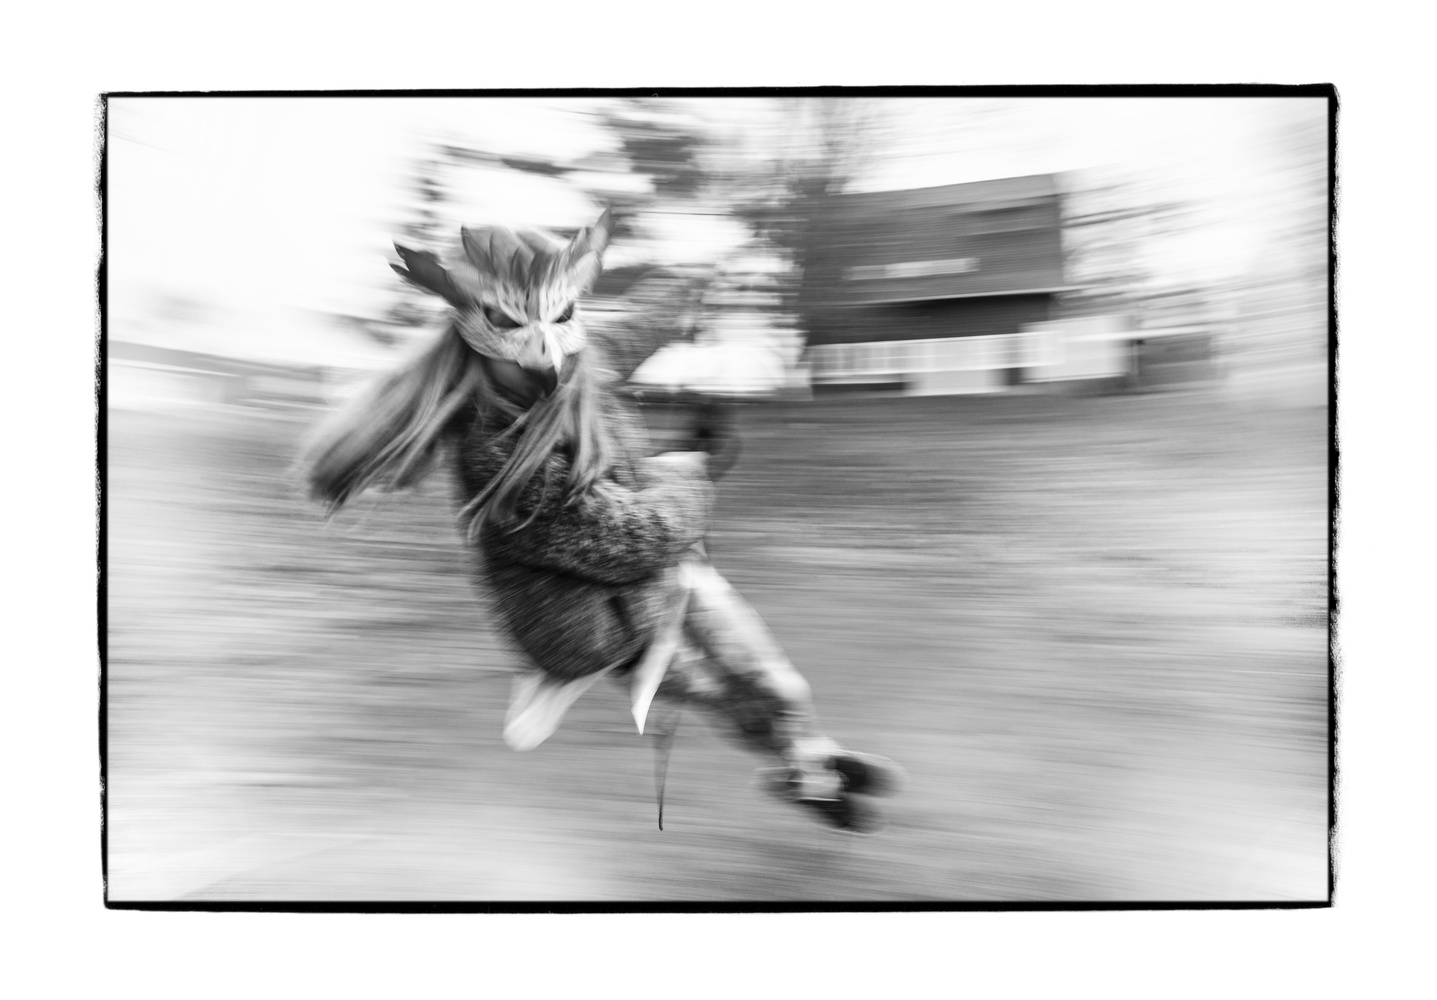 Aerie by Glen Seelenbrandt